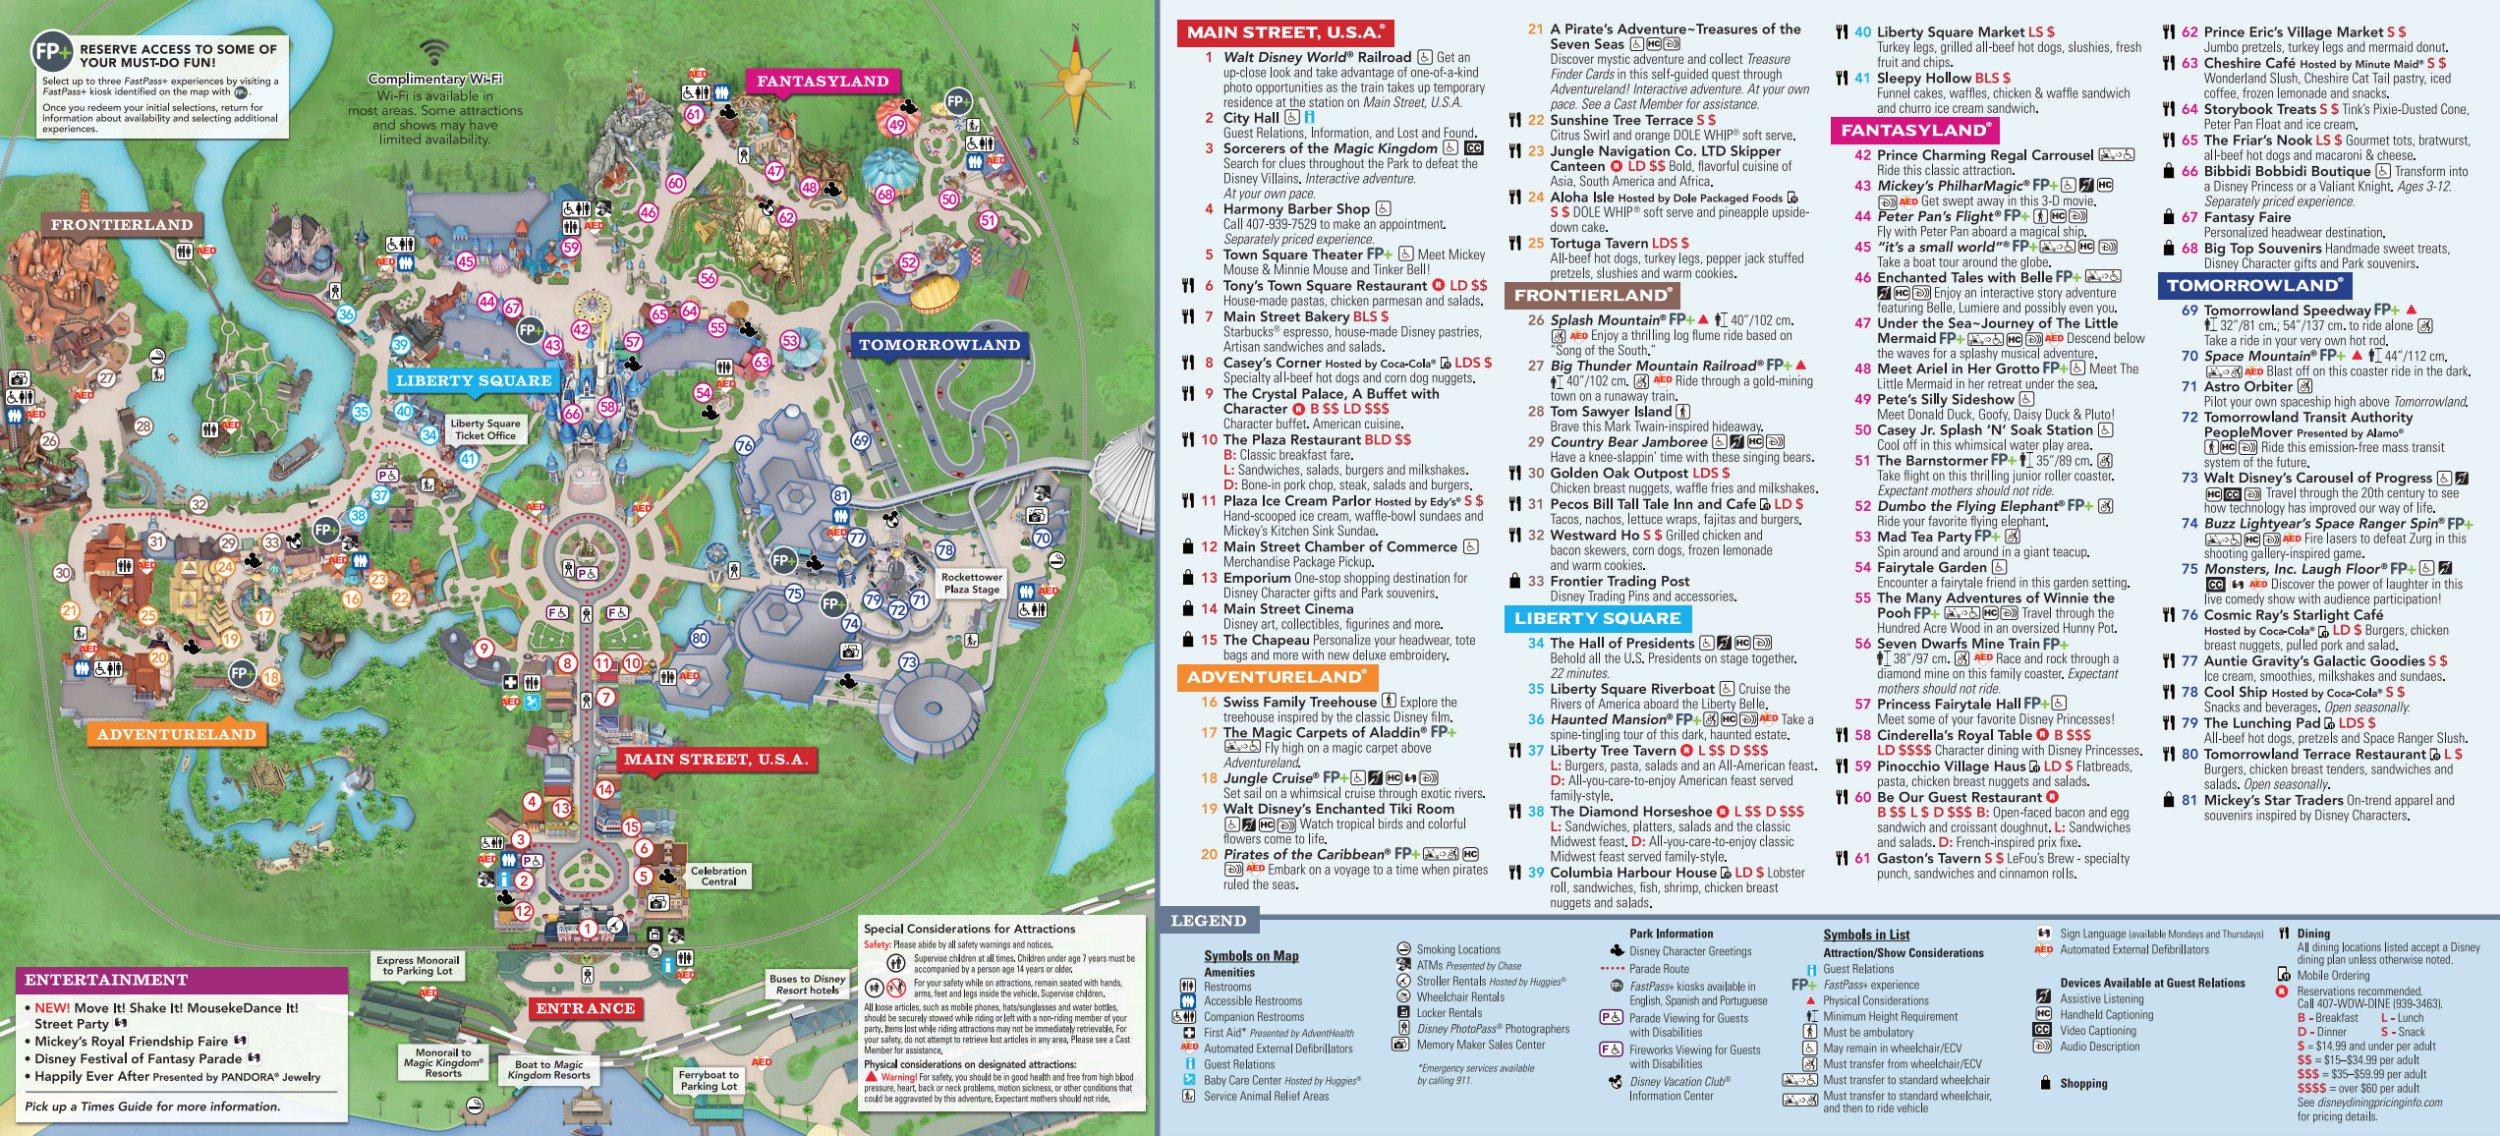 Magic Kingdom Park Map - Walt Disney World - Printable Disney World Maps 2017